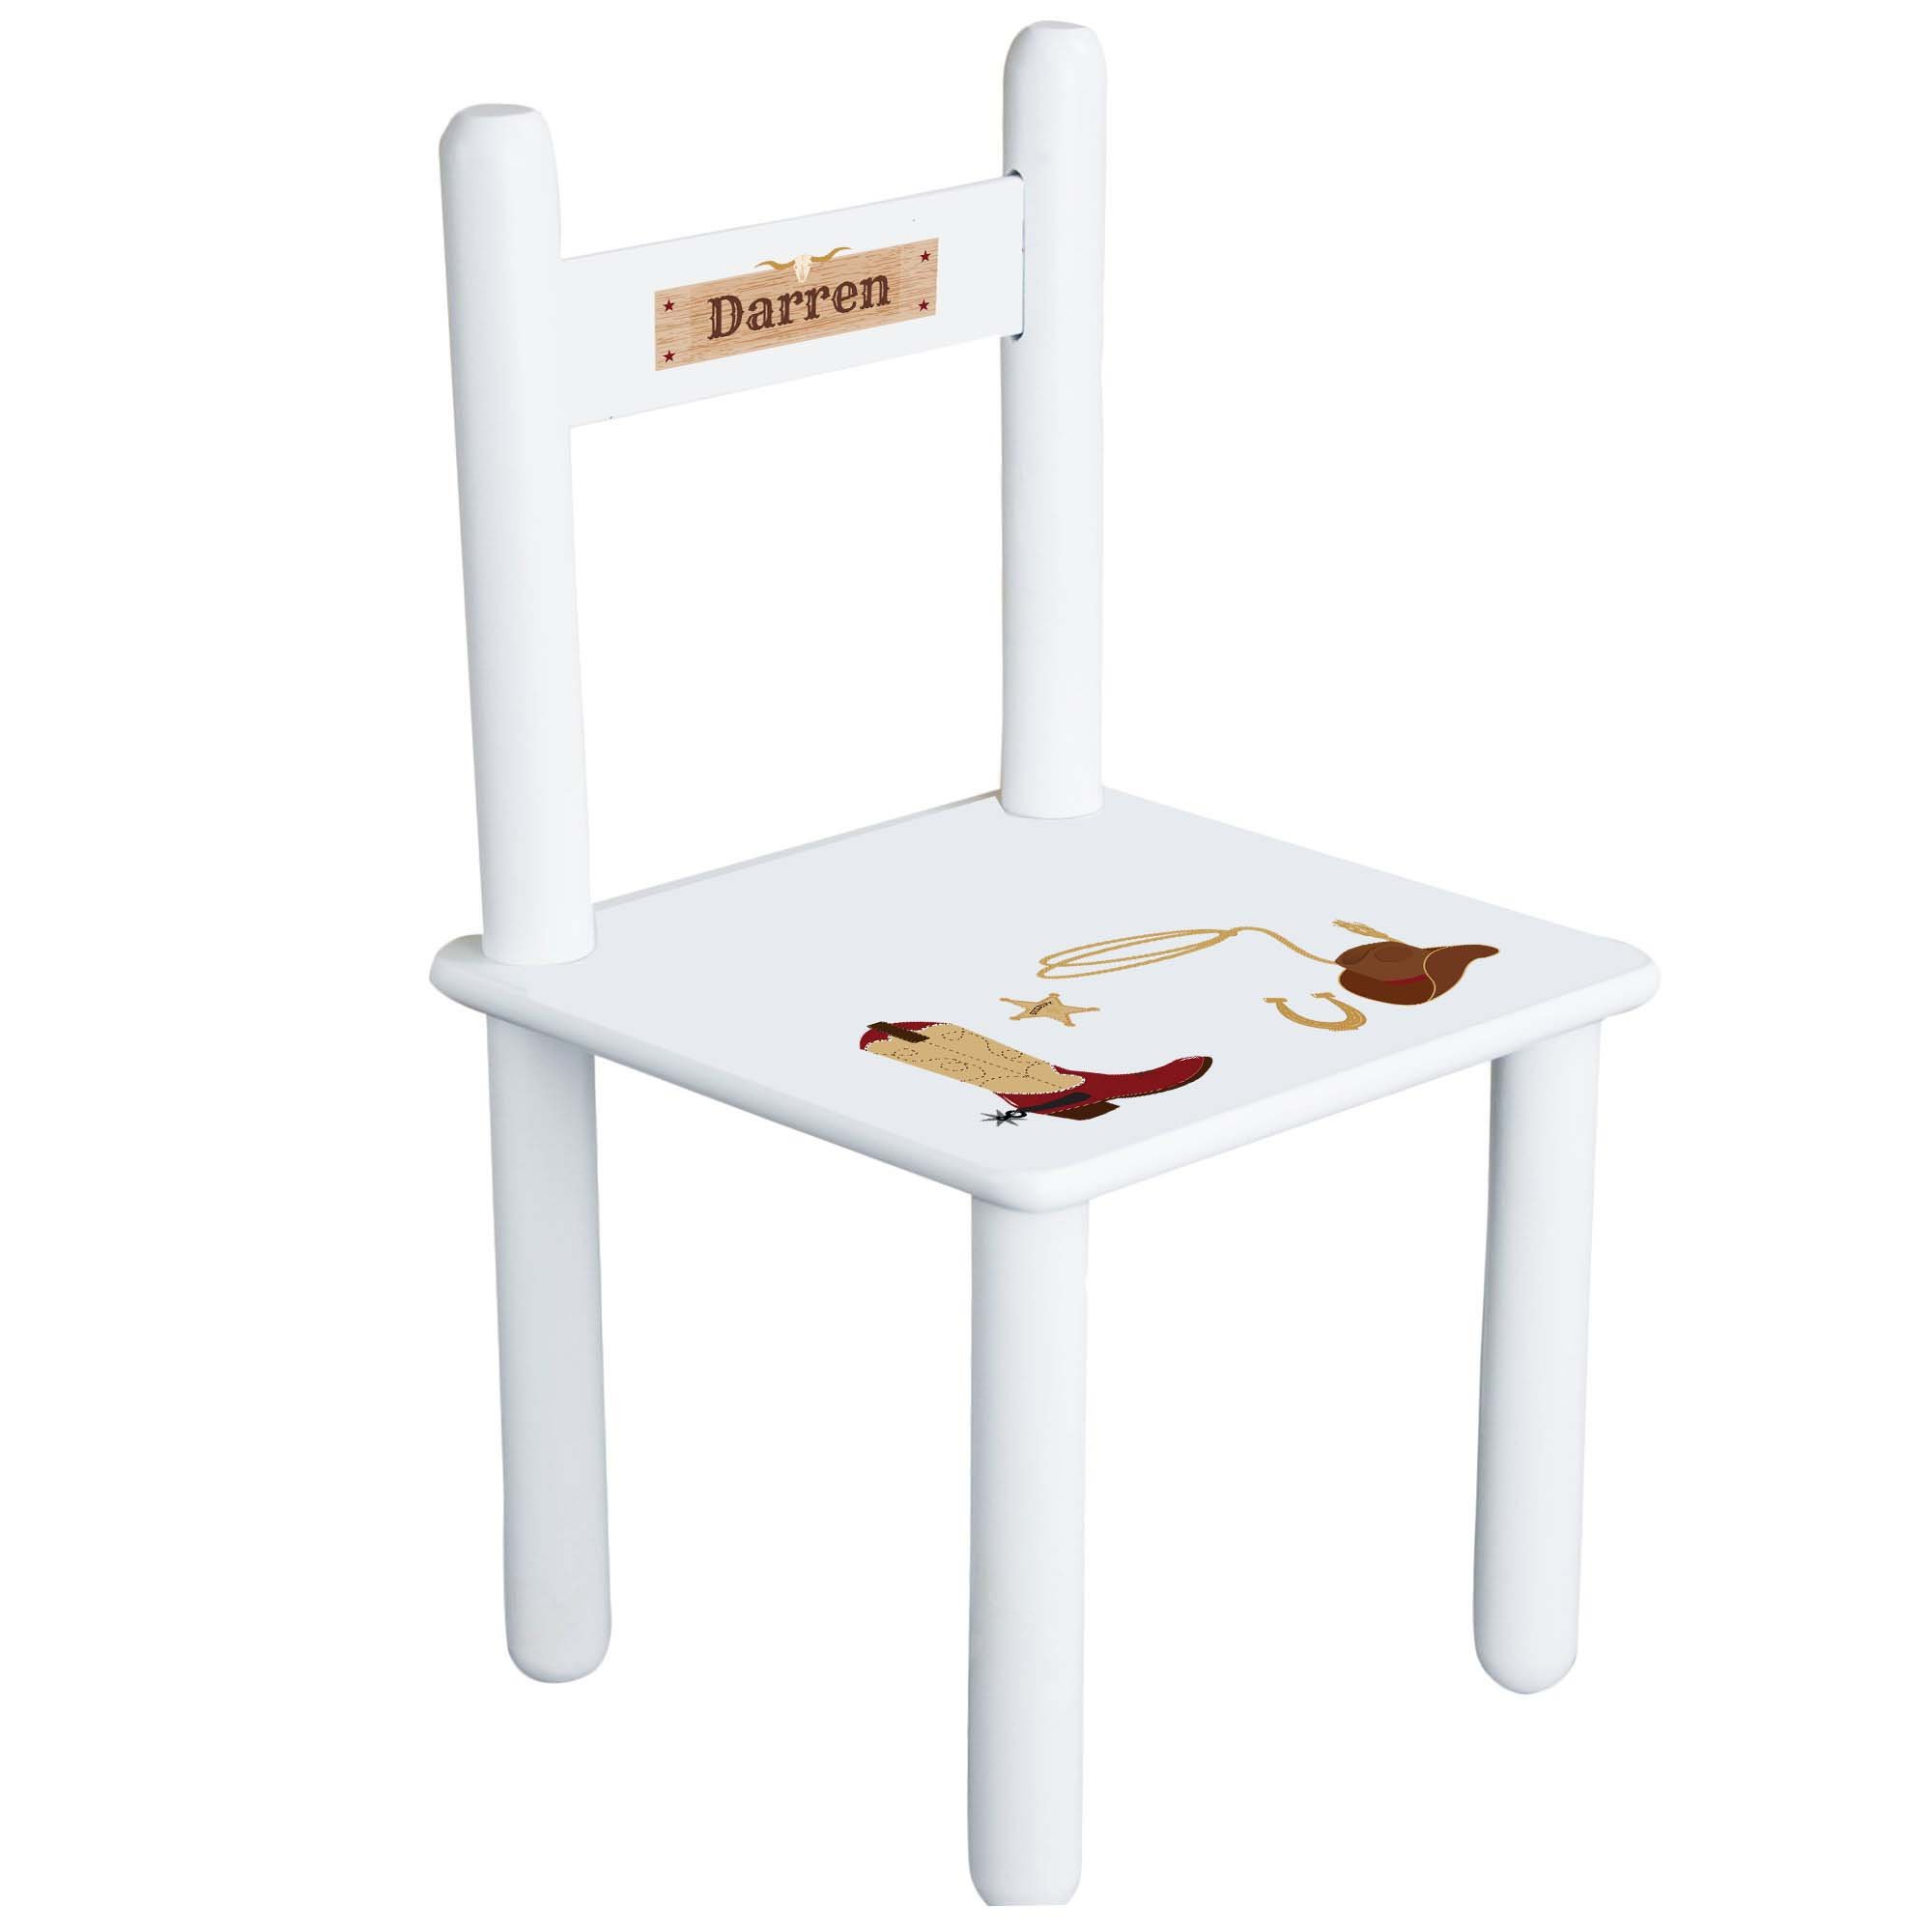 MyBambino Personalized Wild West theme Childrens Chair